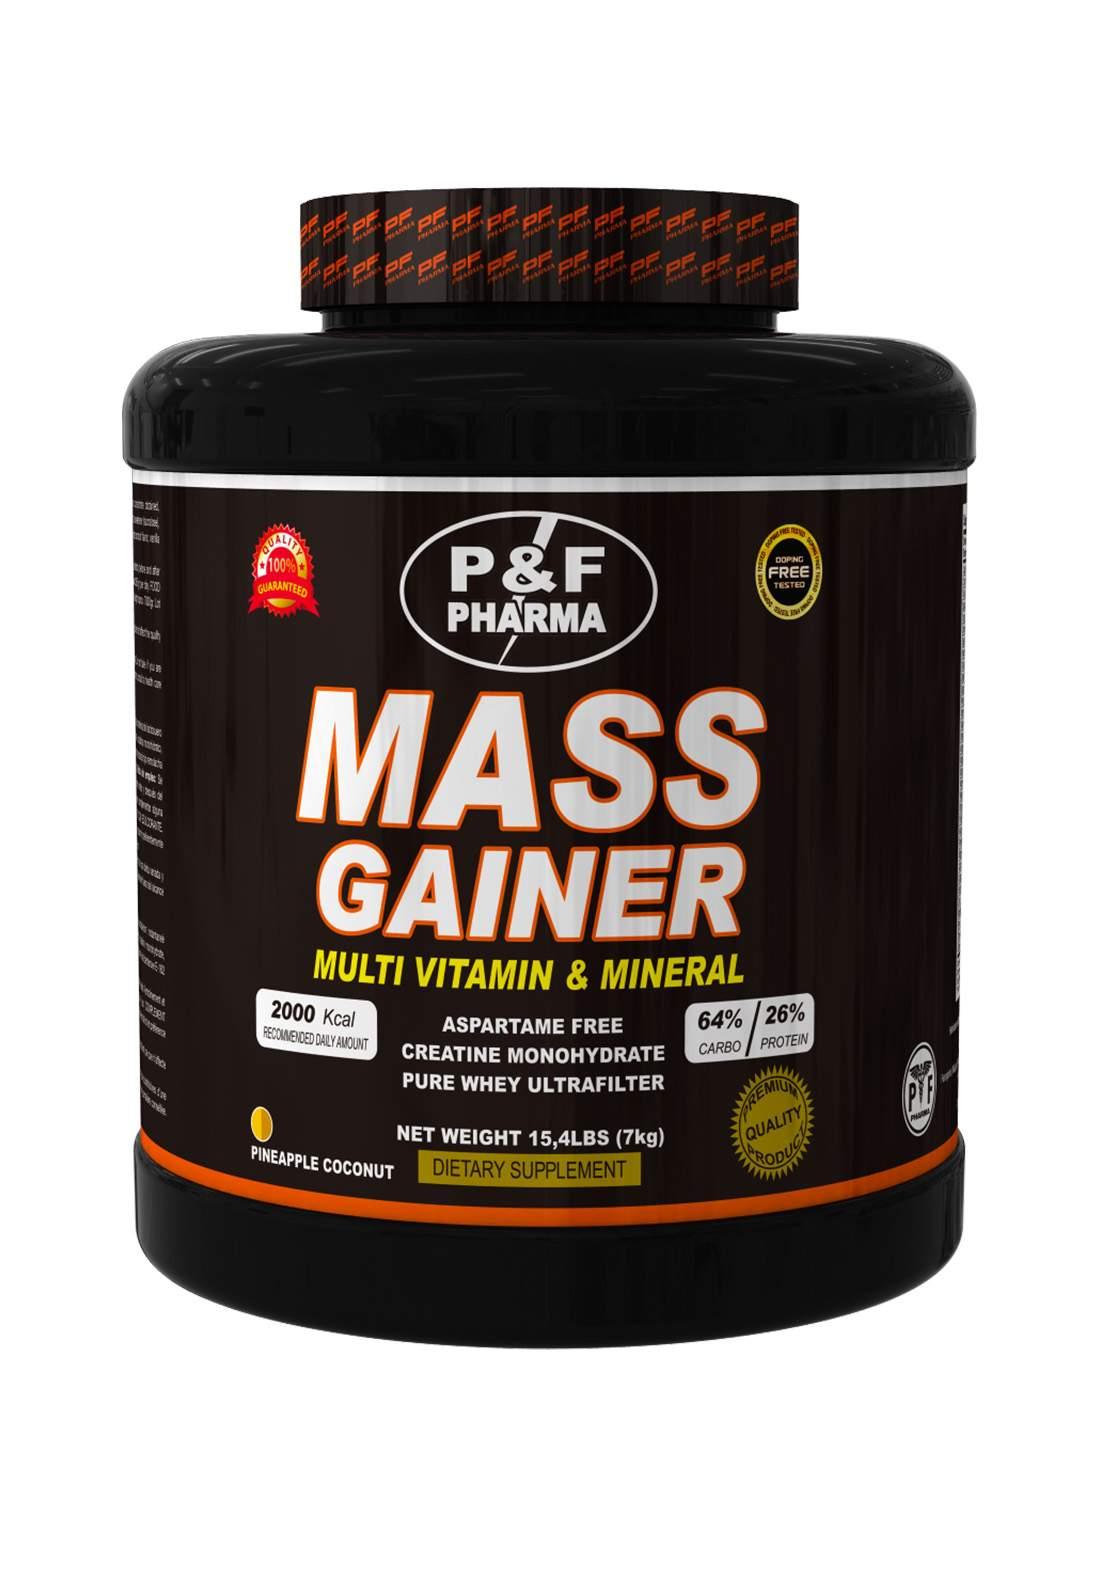 P&F Pharma Mass Gainer-3kg مكمل غذائي